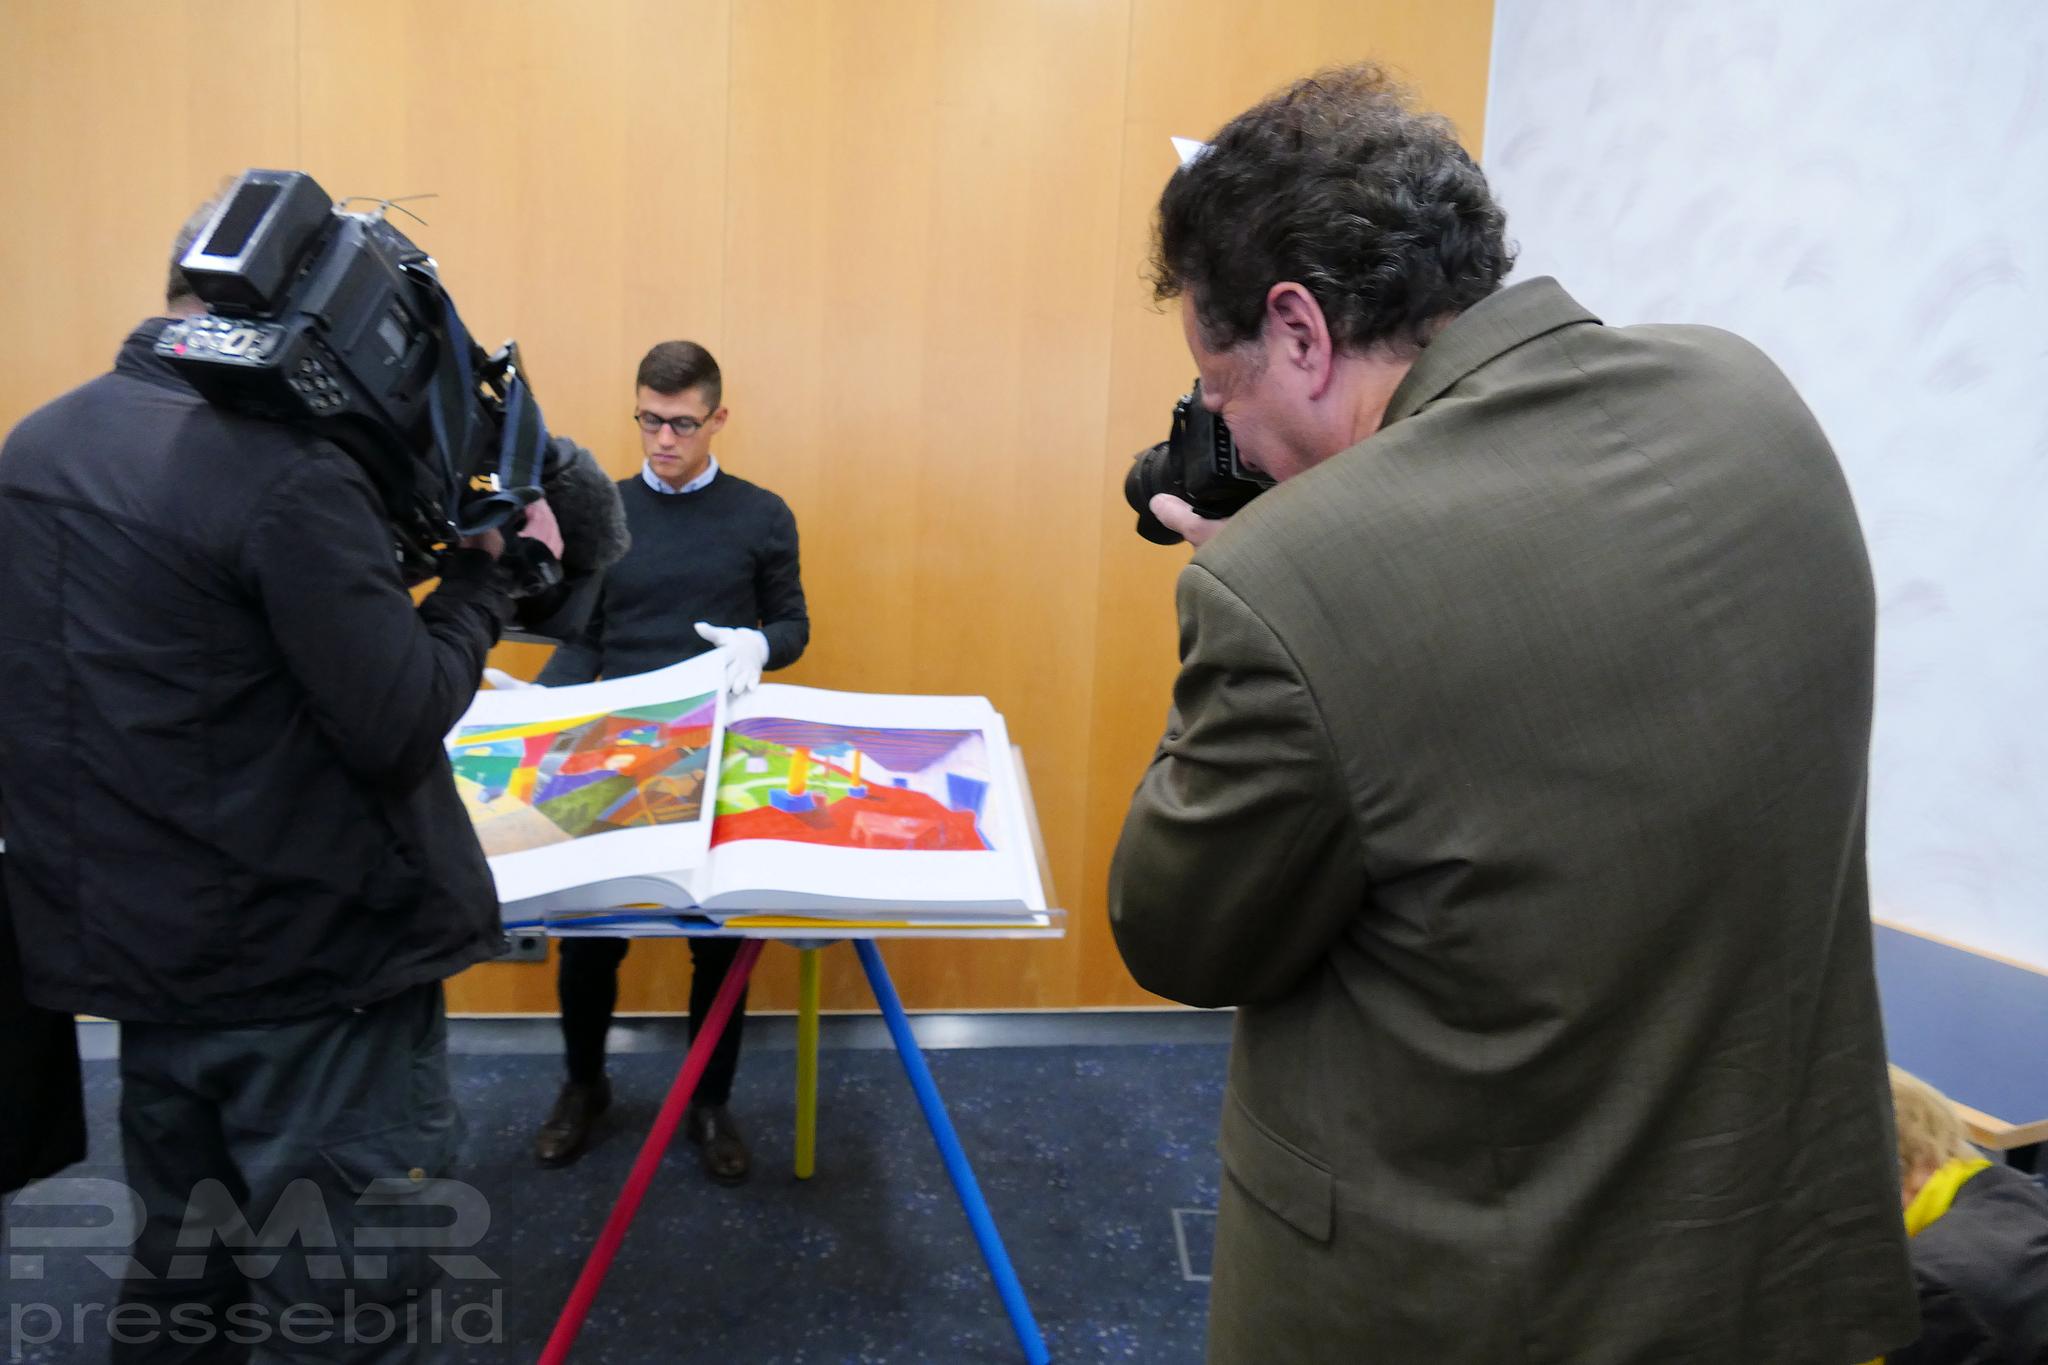 Medien © dokfoto.de / Klaus Leitzbach